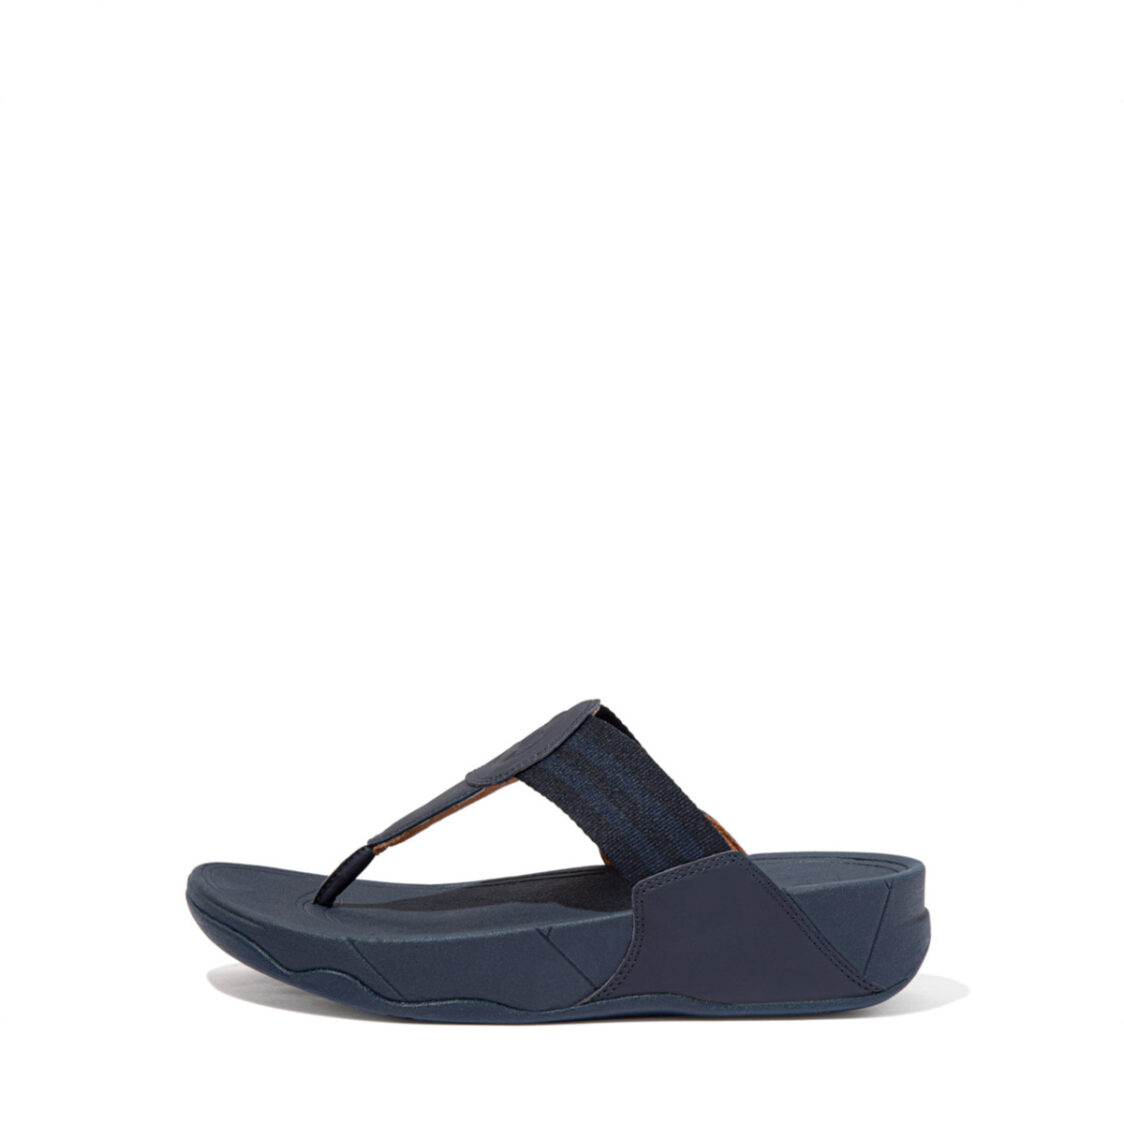 Fitflop Walkstar Toe-Post Sandals Midnight Navy Dx4-399